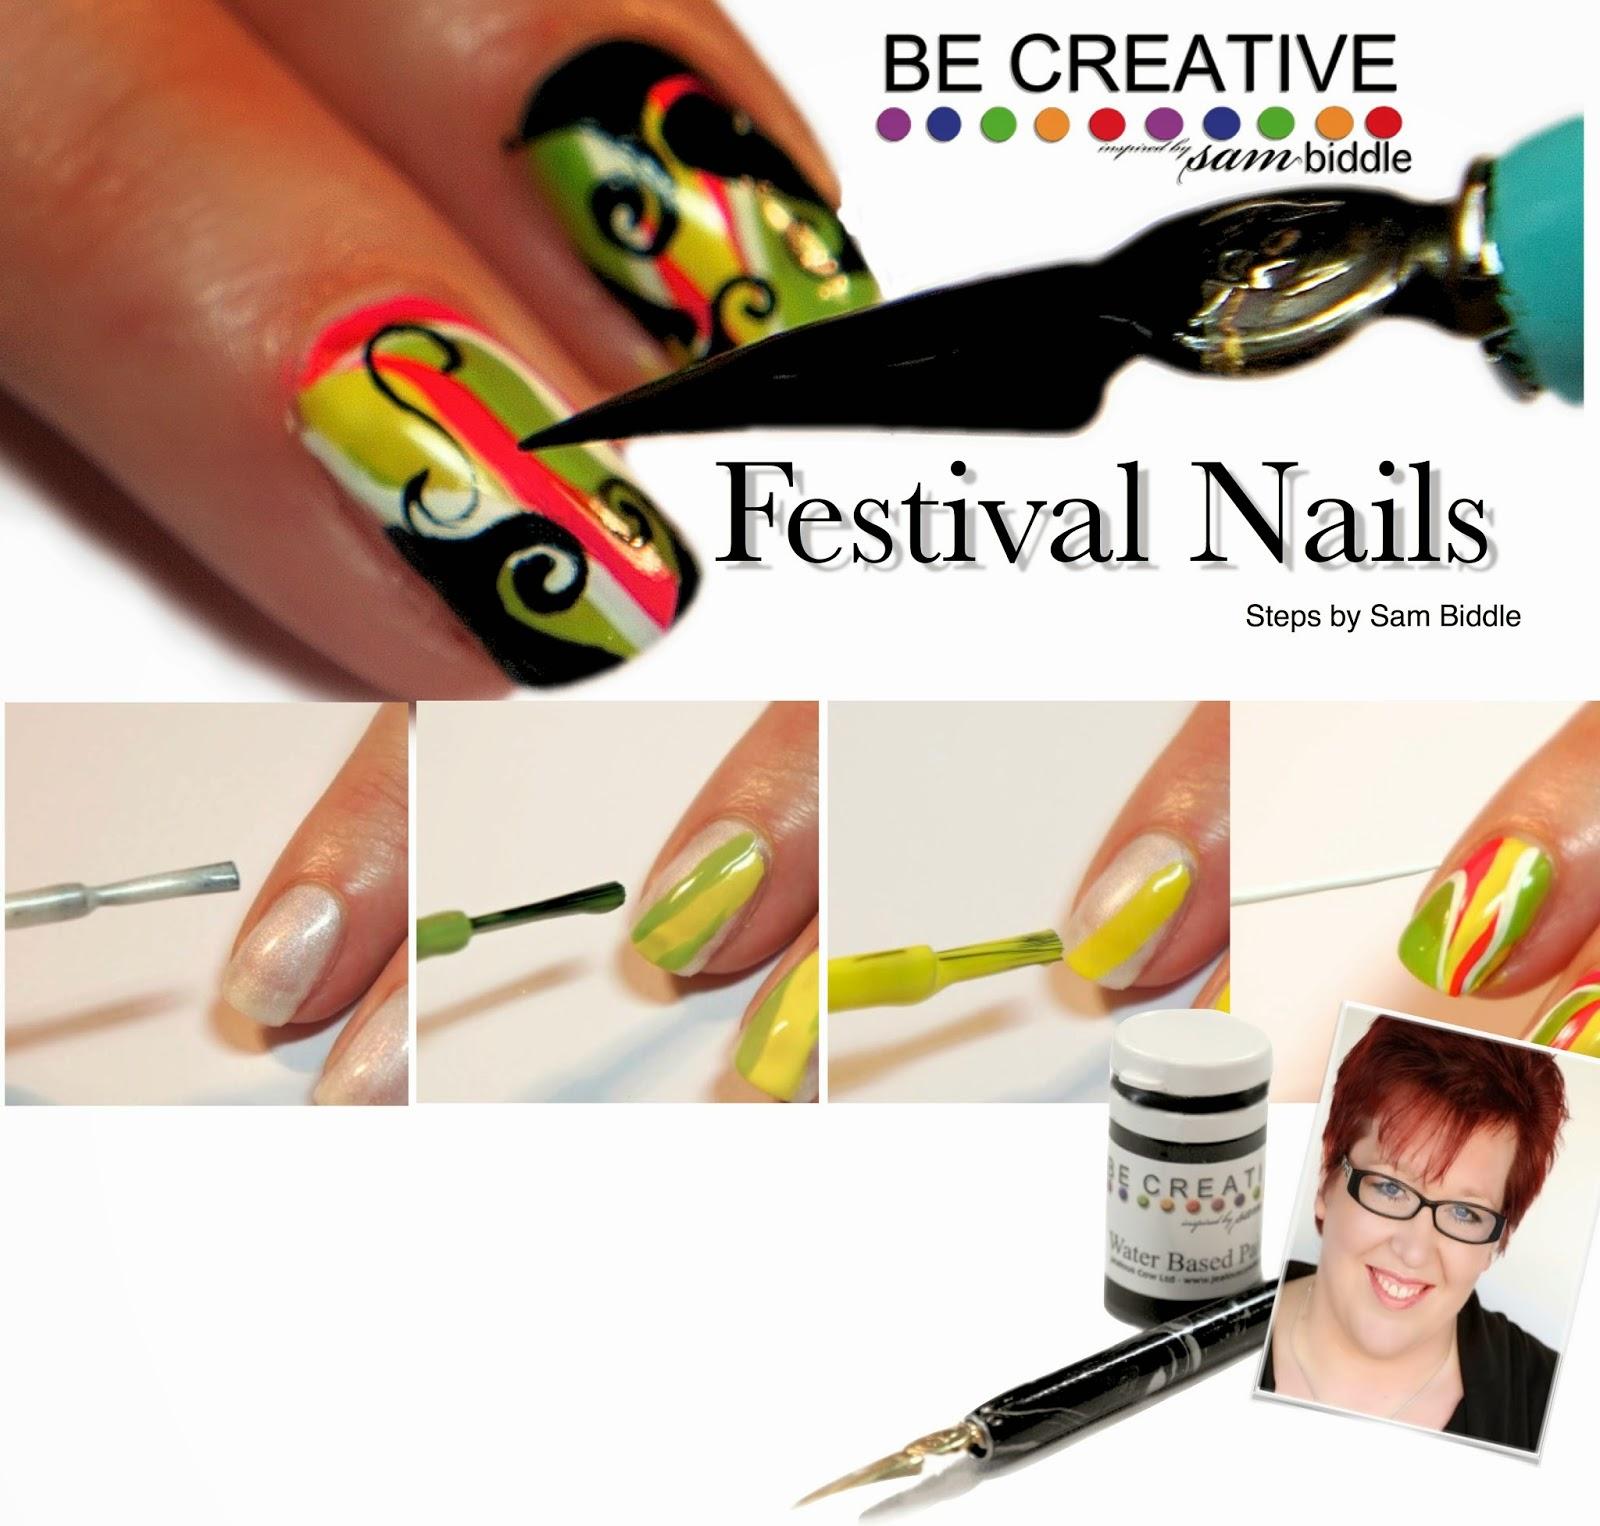 Sam Biddle: Festival Nails - a step by step